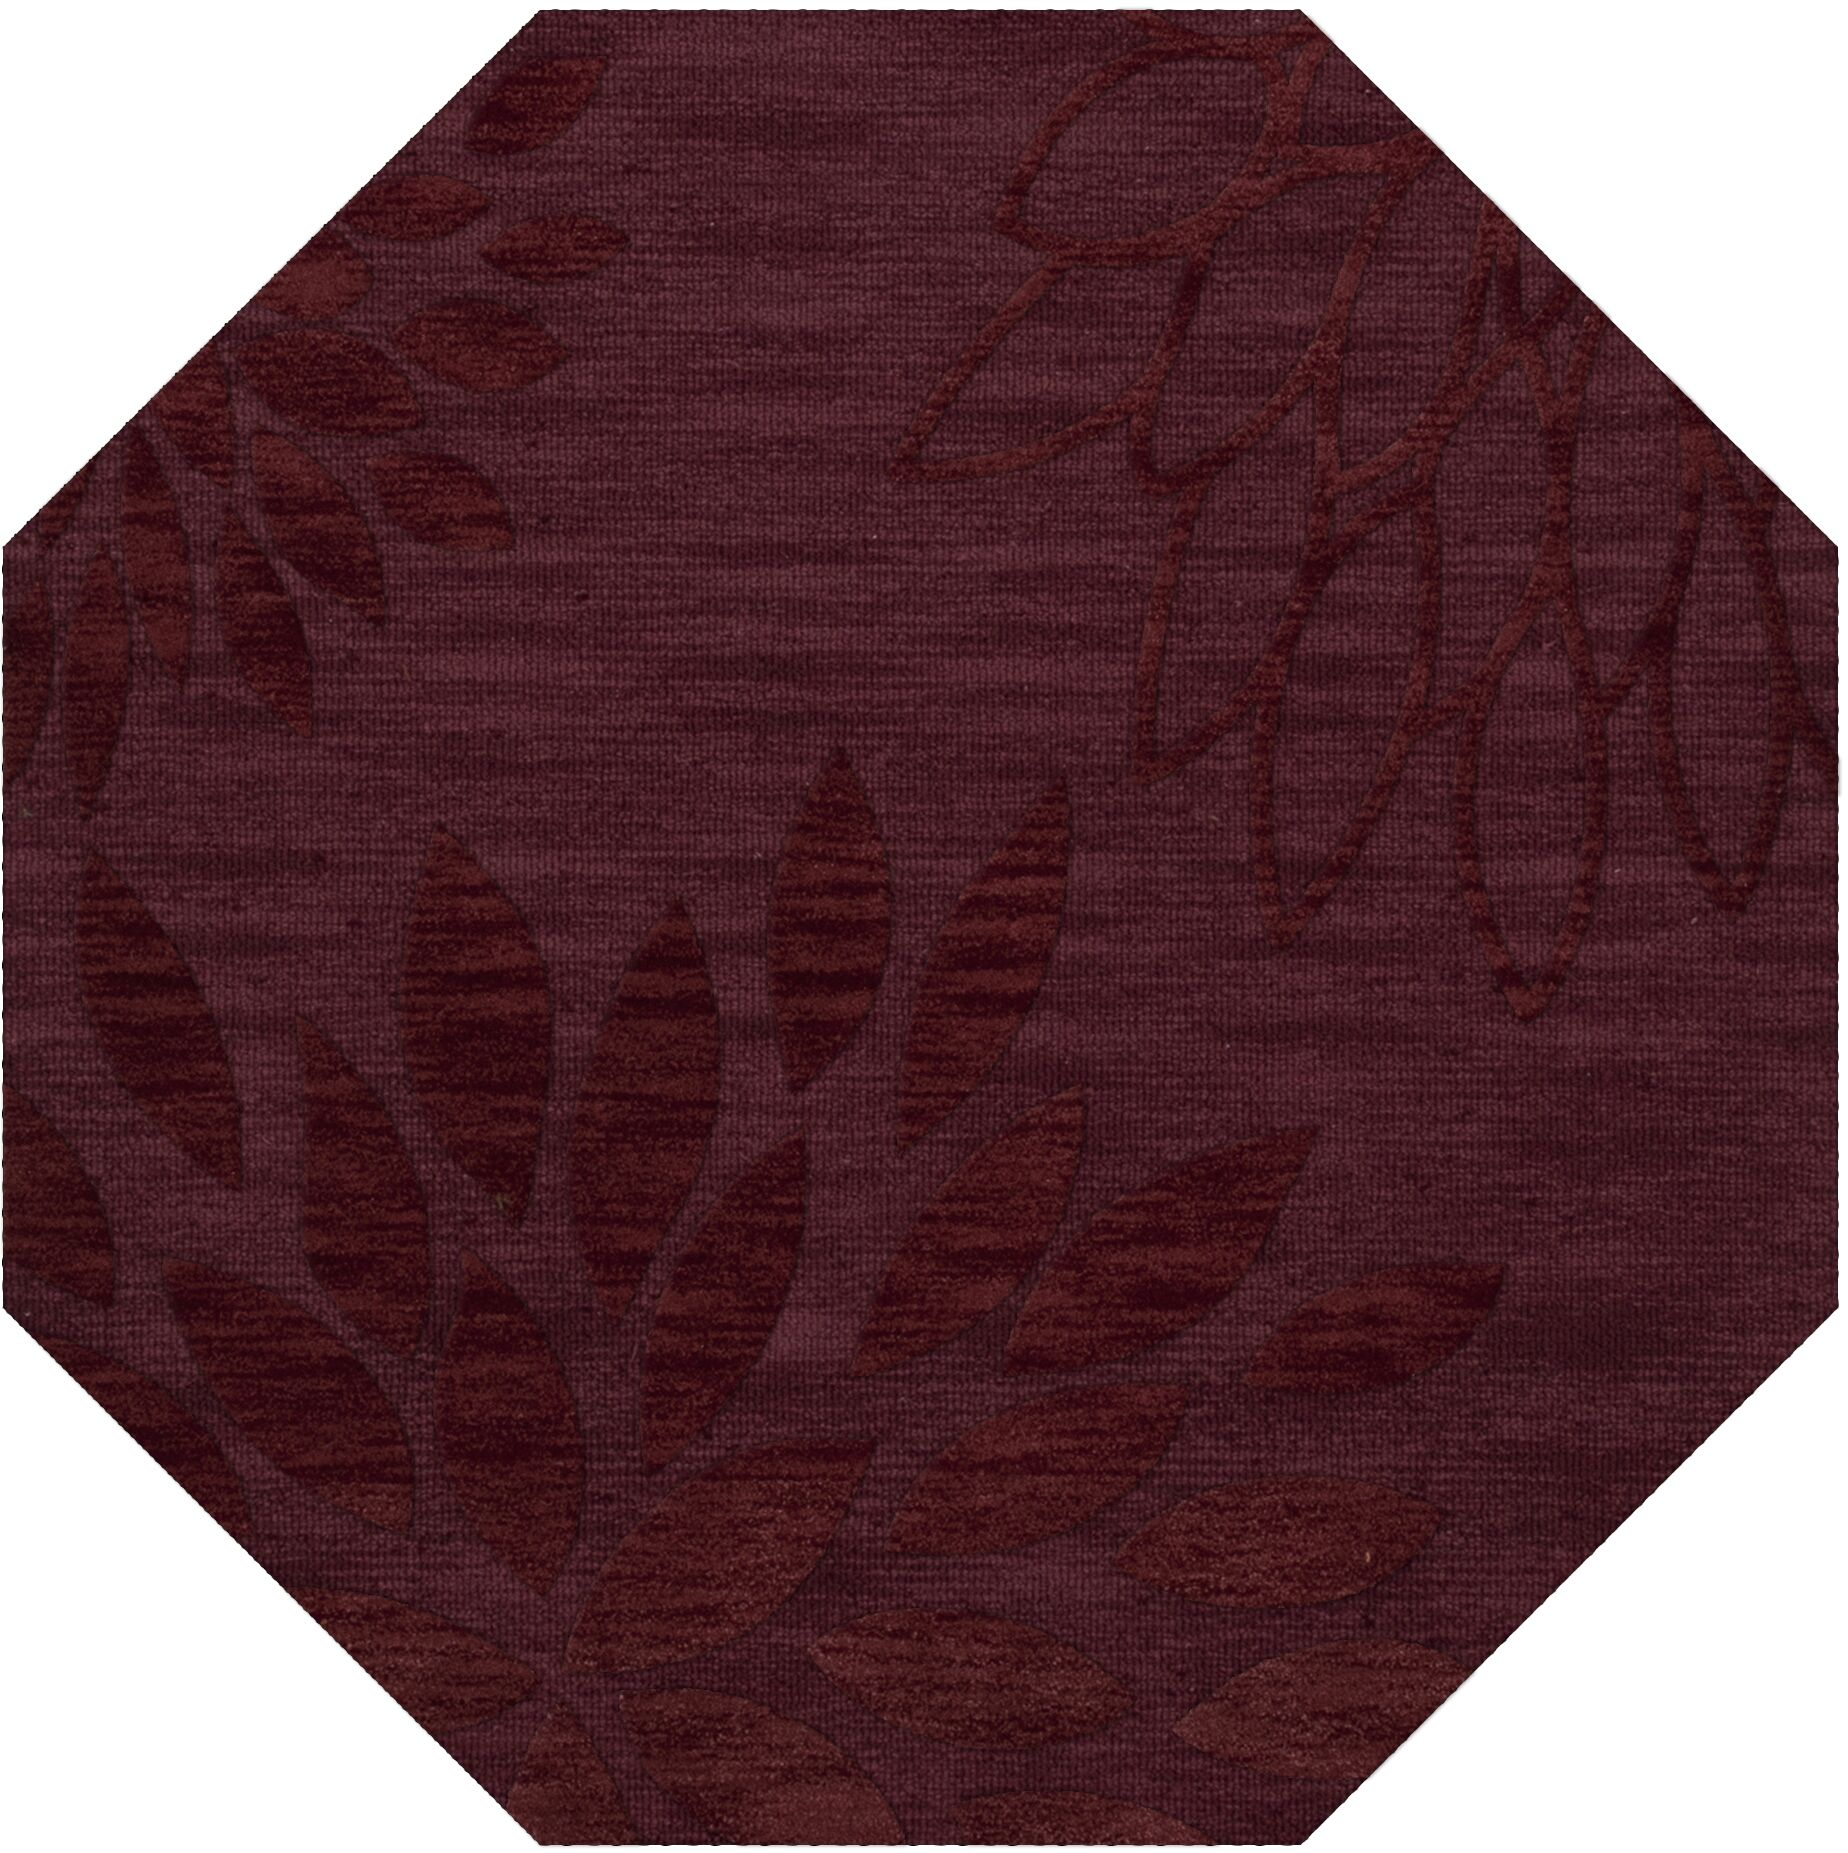 Bao Burgundy Area Rug Rug Size: Octagon 4'